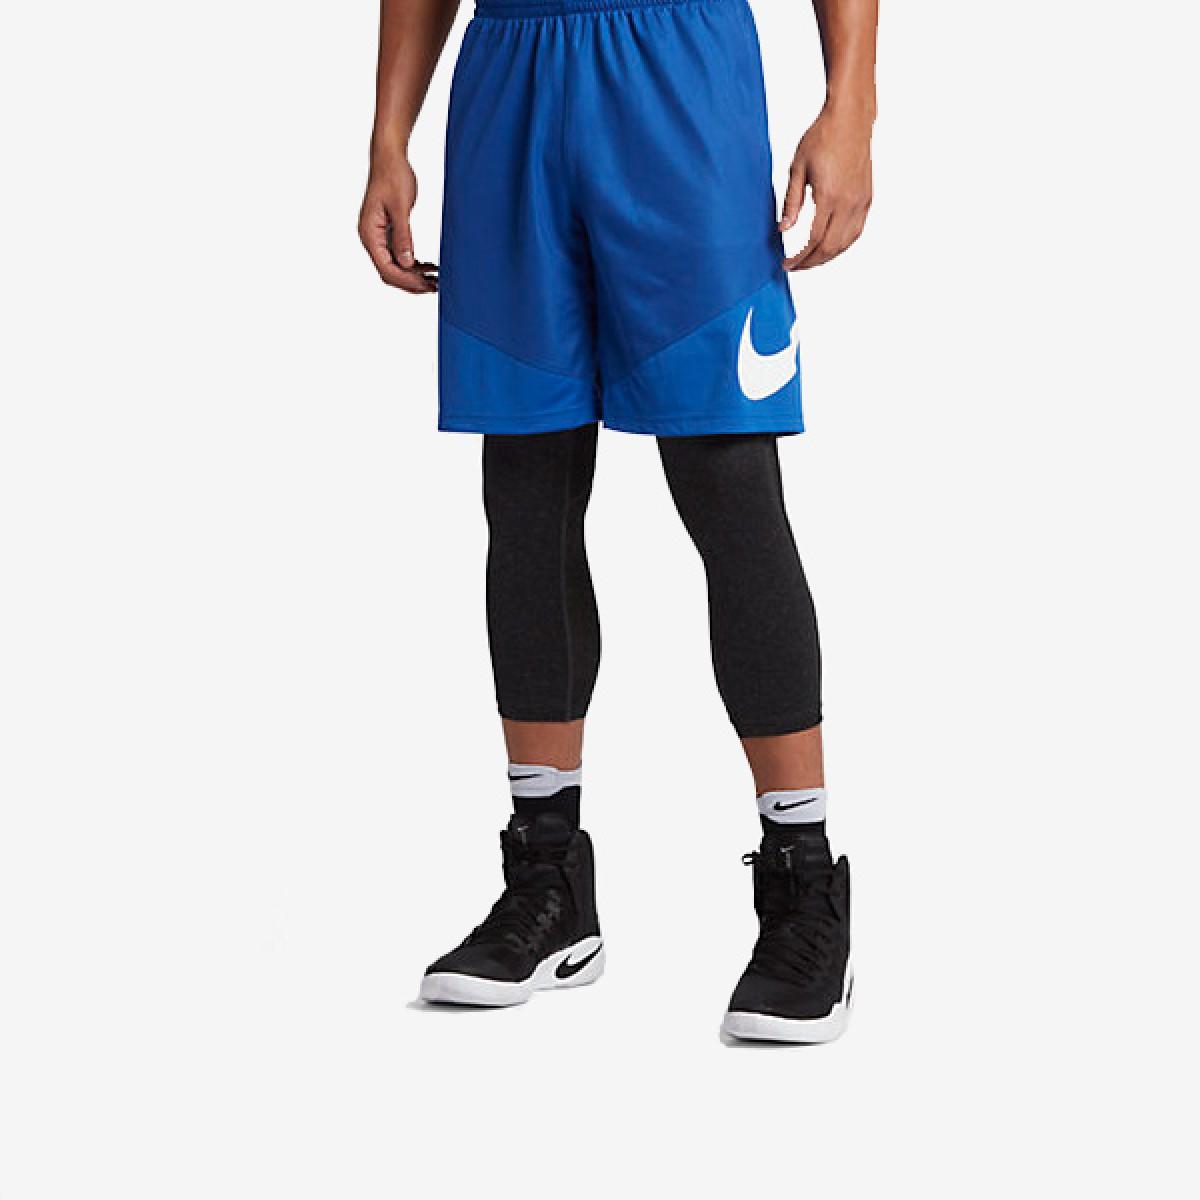 Nike Basketball Short 'Blue Royal'